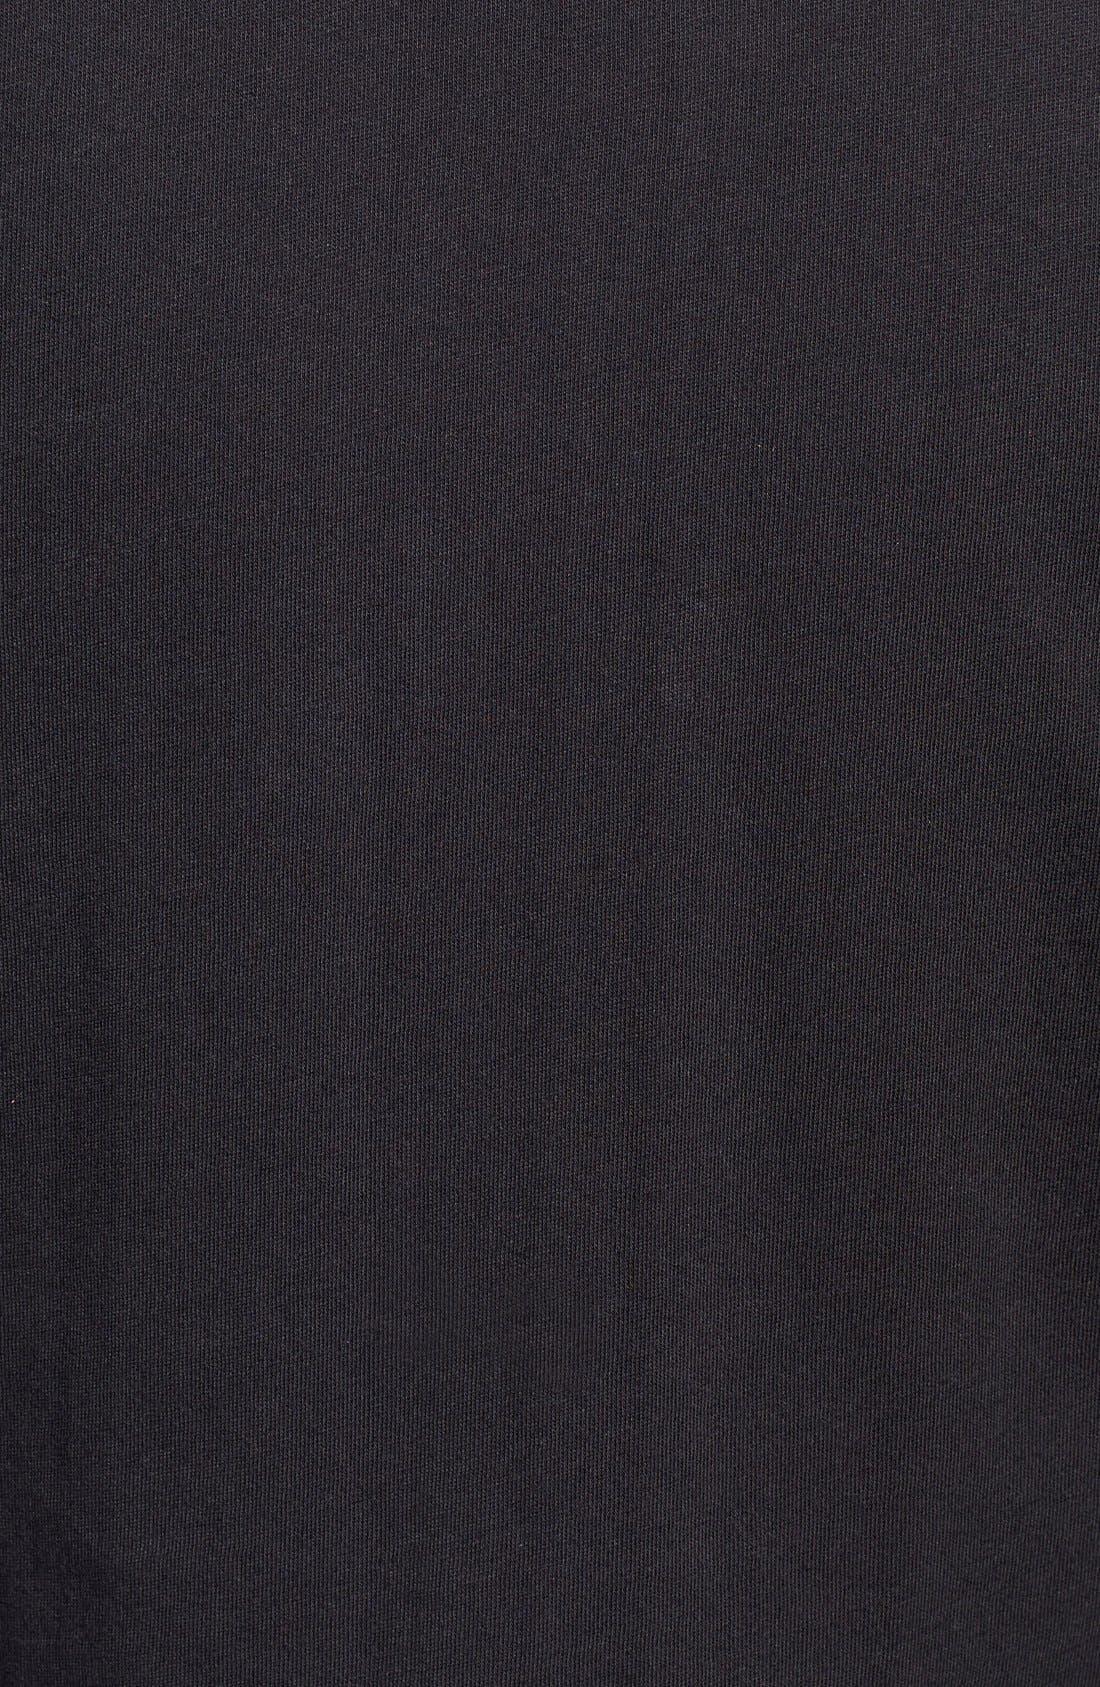 'Reworkd' Slim Fit Solid Mixed Media Sport Shirt,                             Alternate thumbnail 2, color,                             001